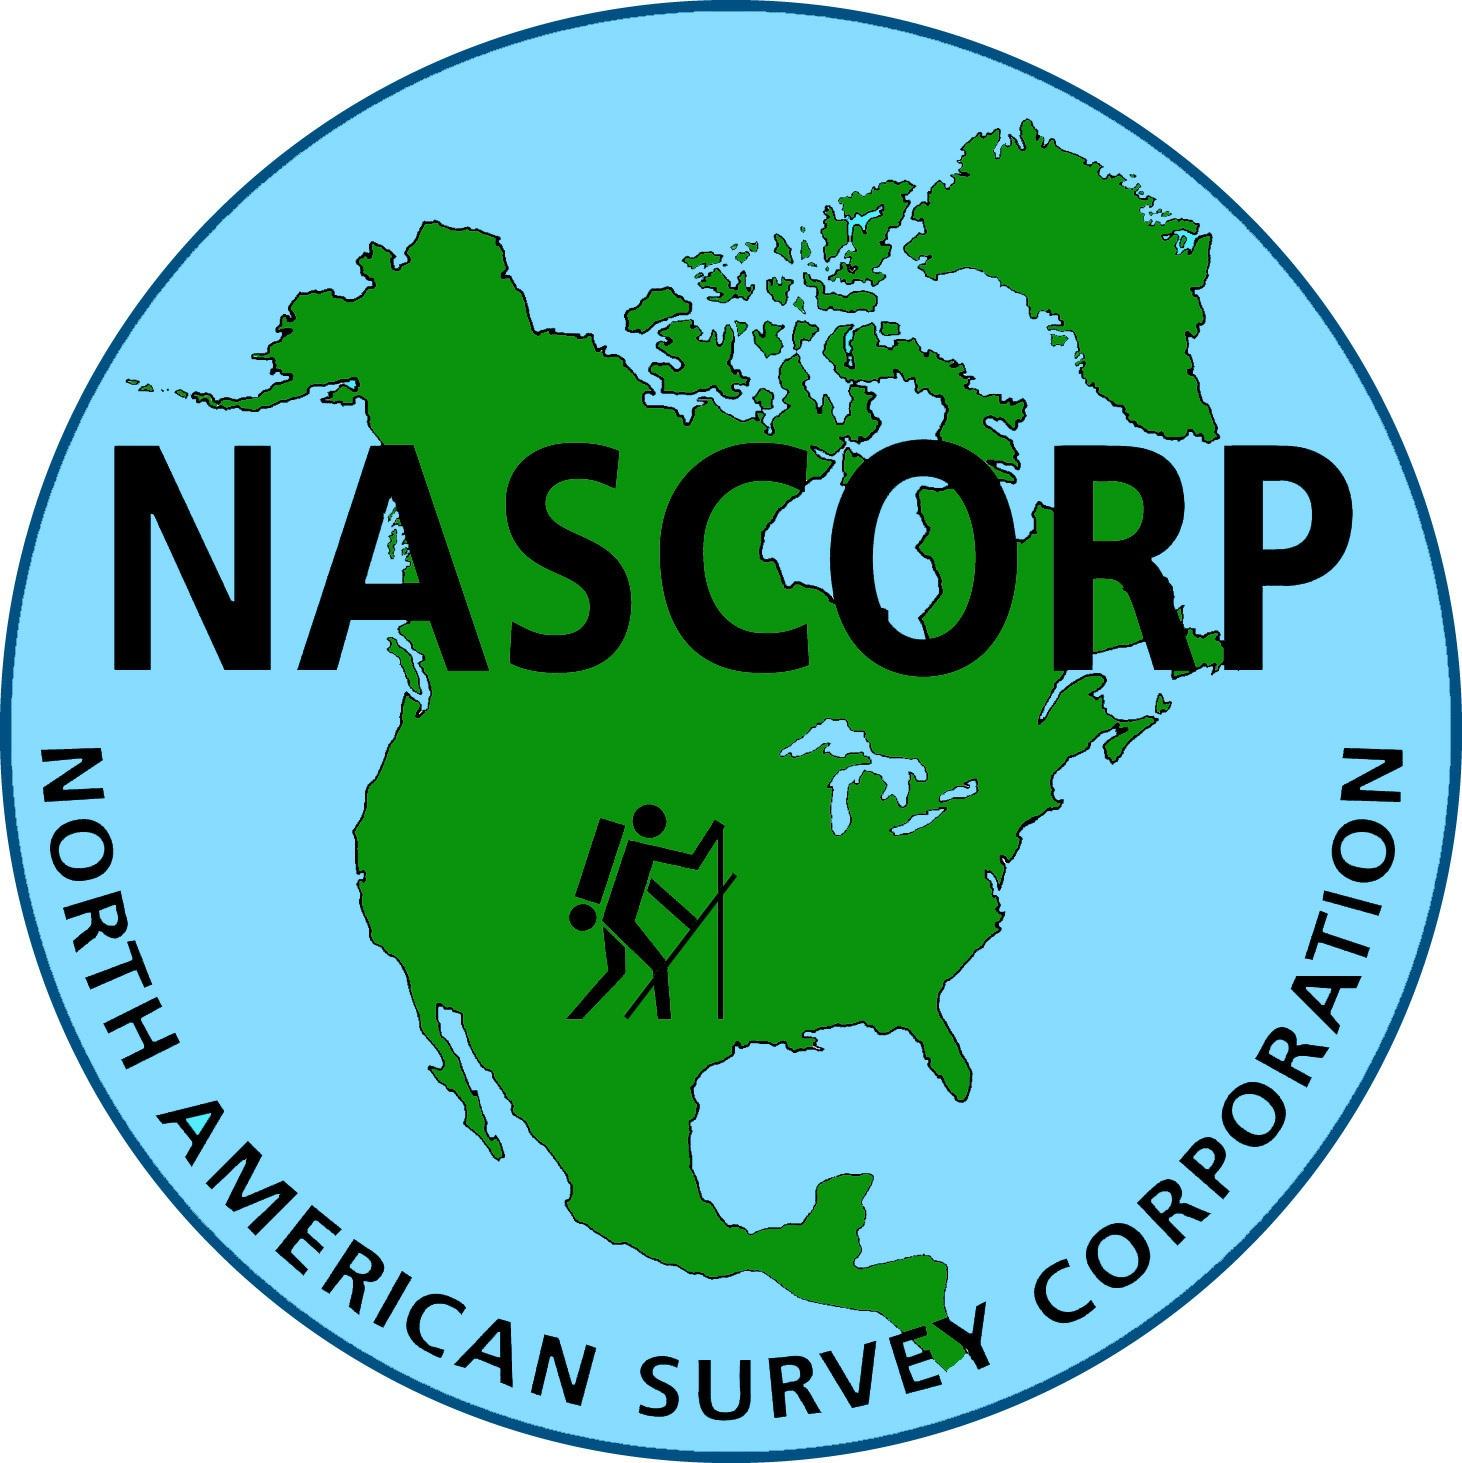 North American Survey Corporation